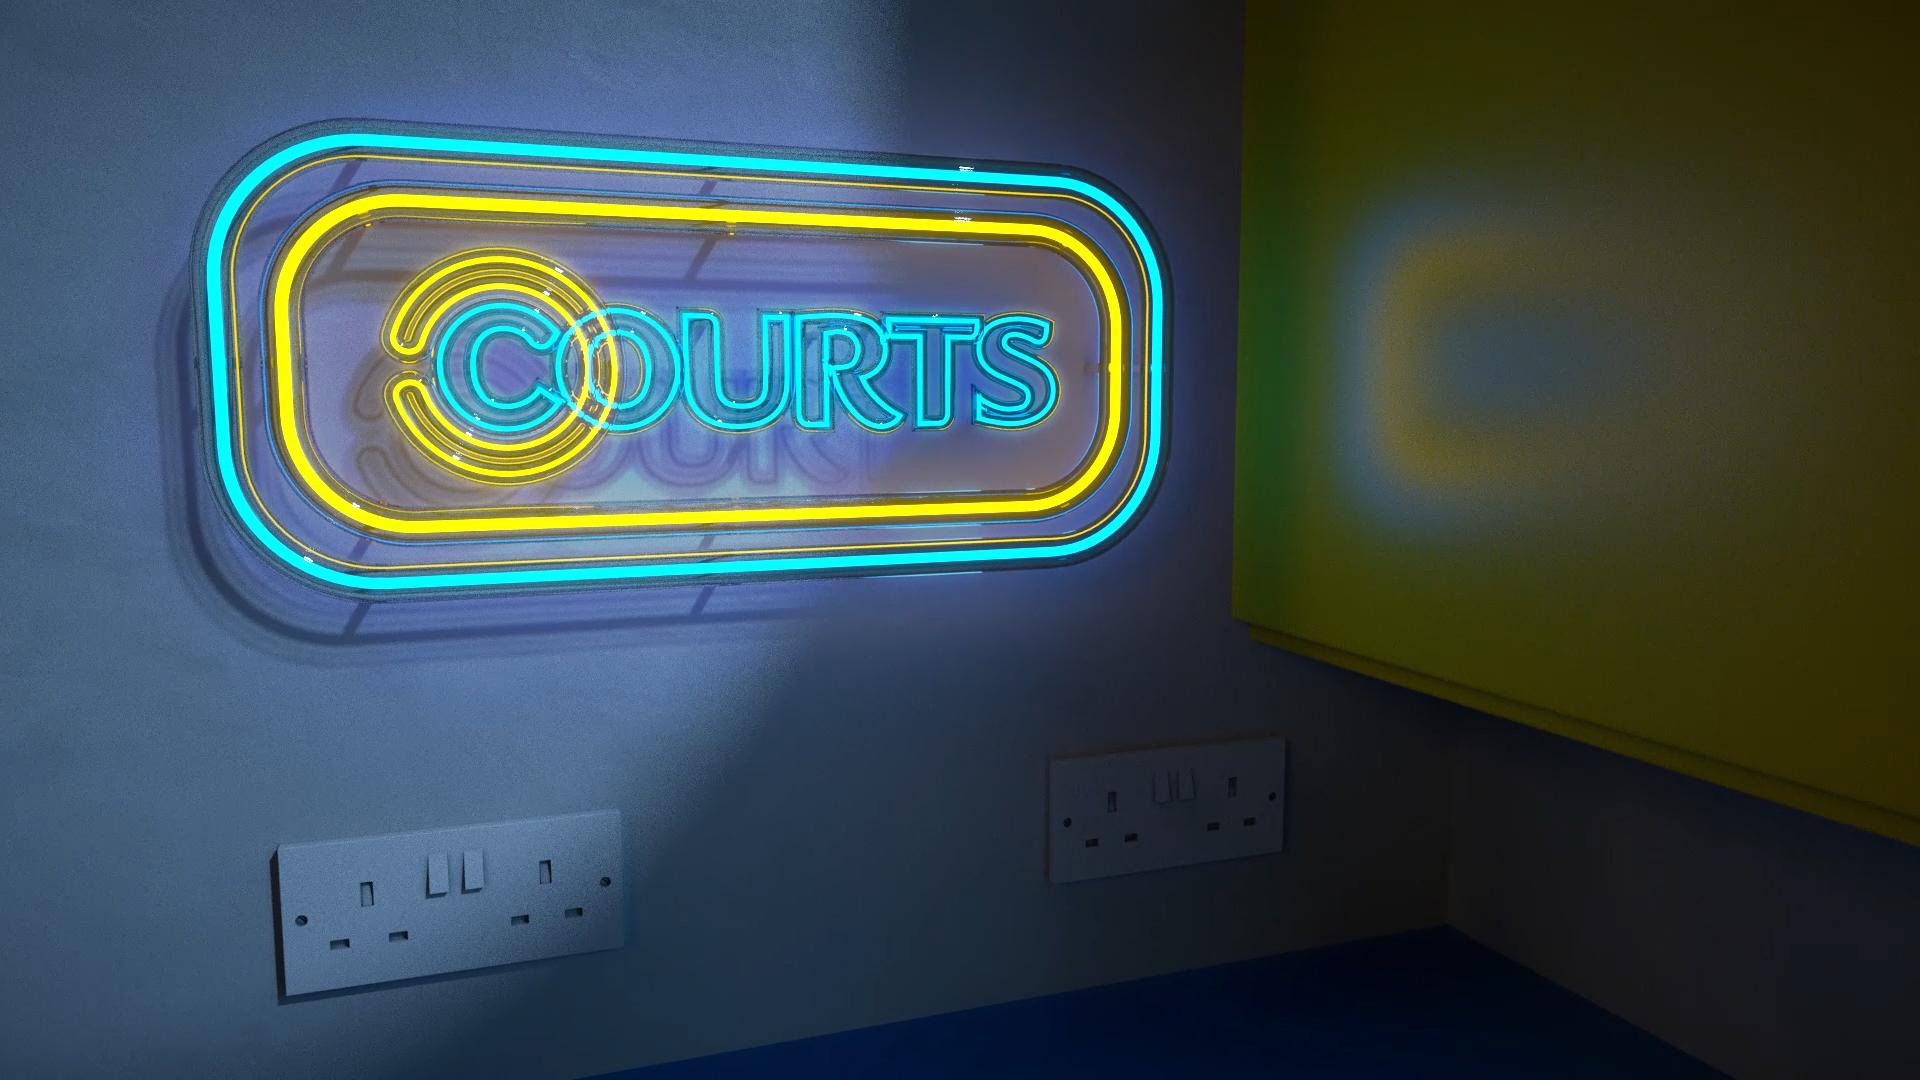 Courts_BlackFridayCyberMonday_FA (0-00-03-21).jpg